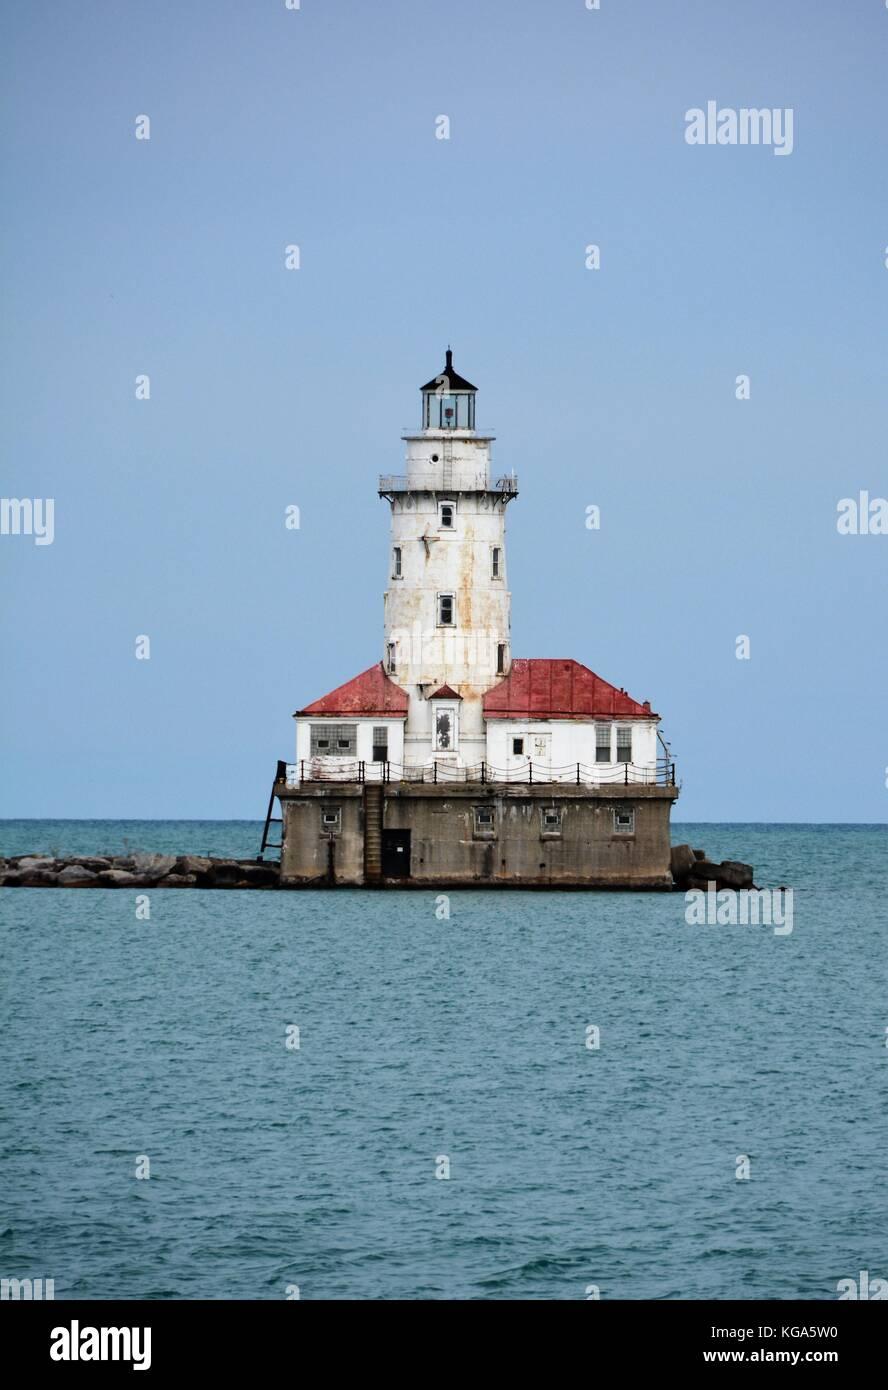 Old Lighthouse on Lake Michigan - Stock Image